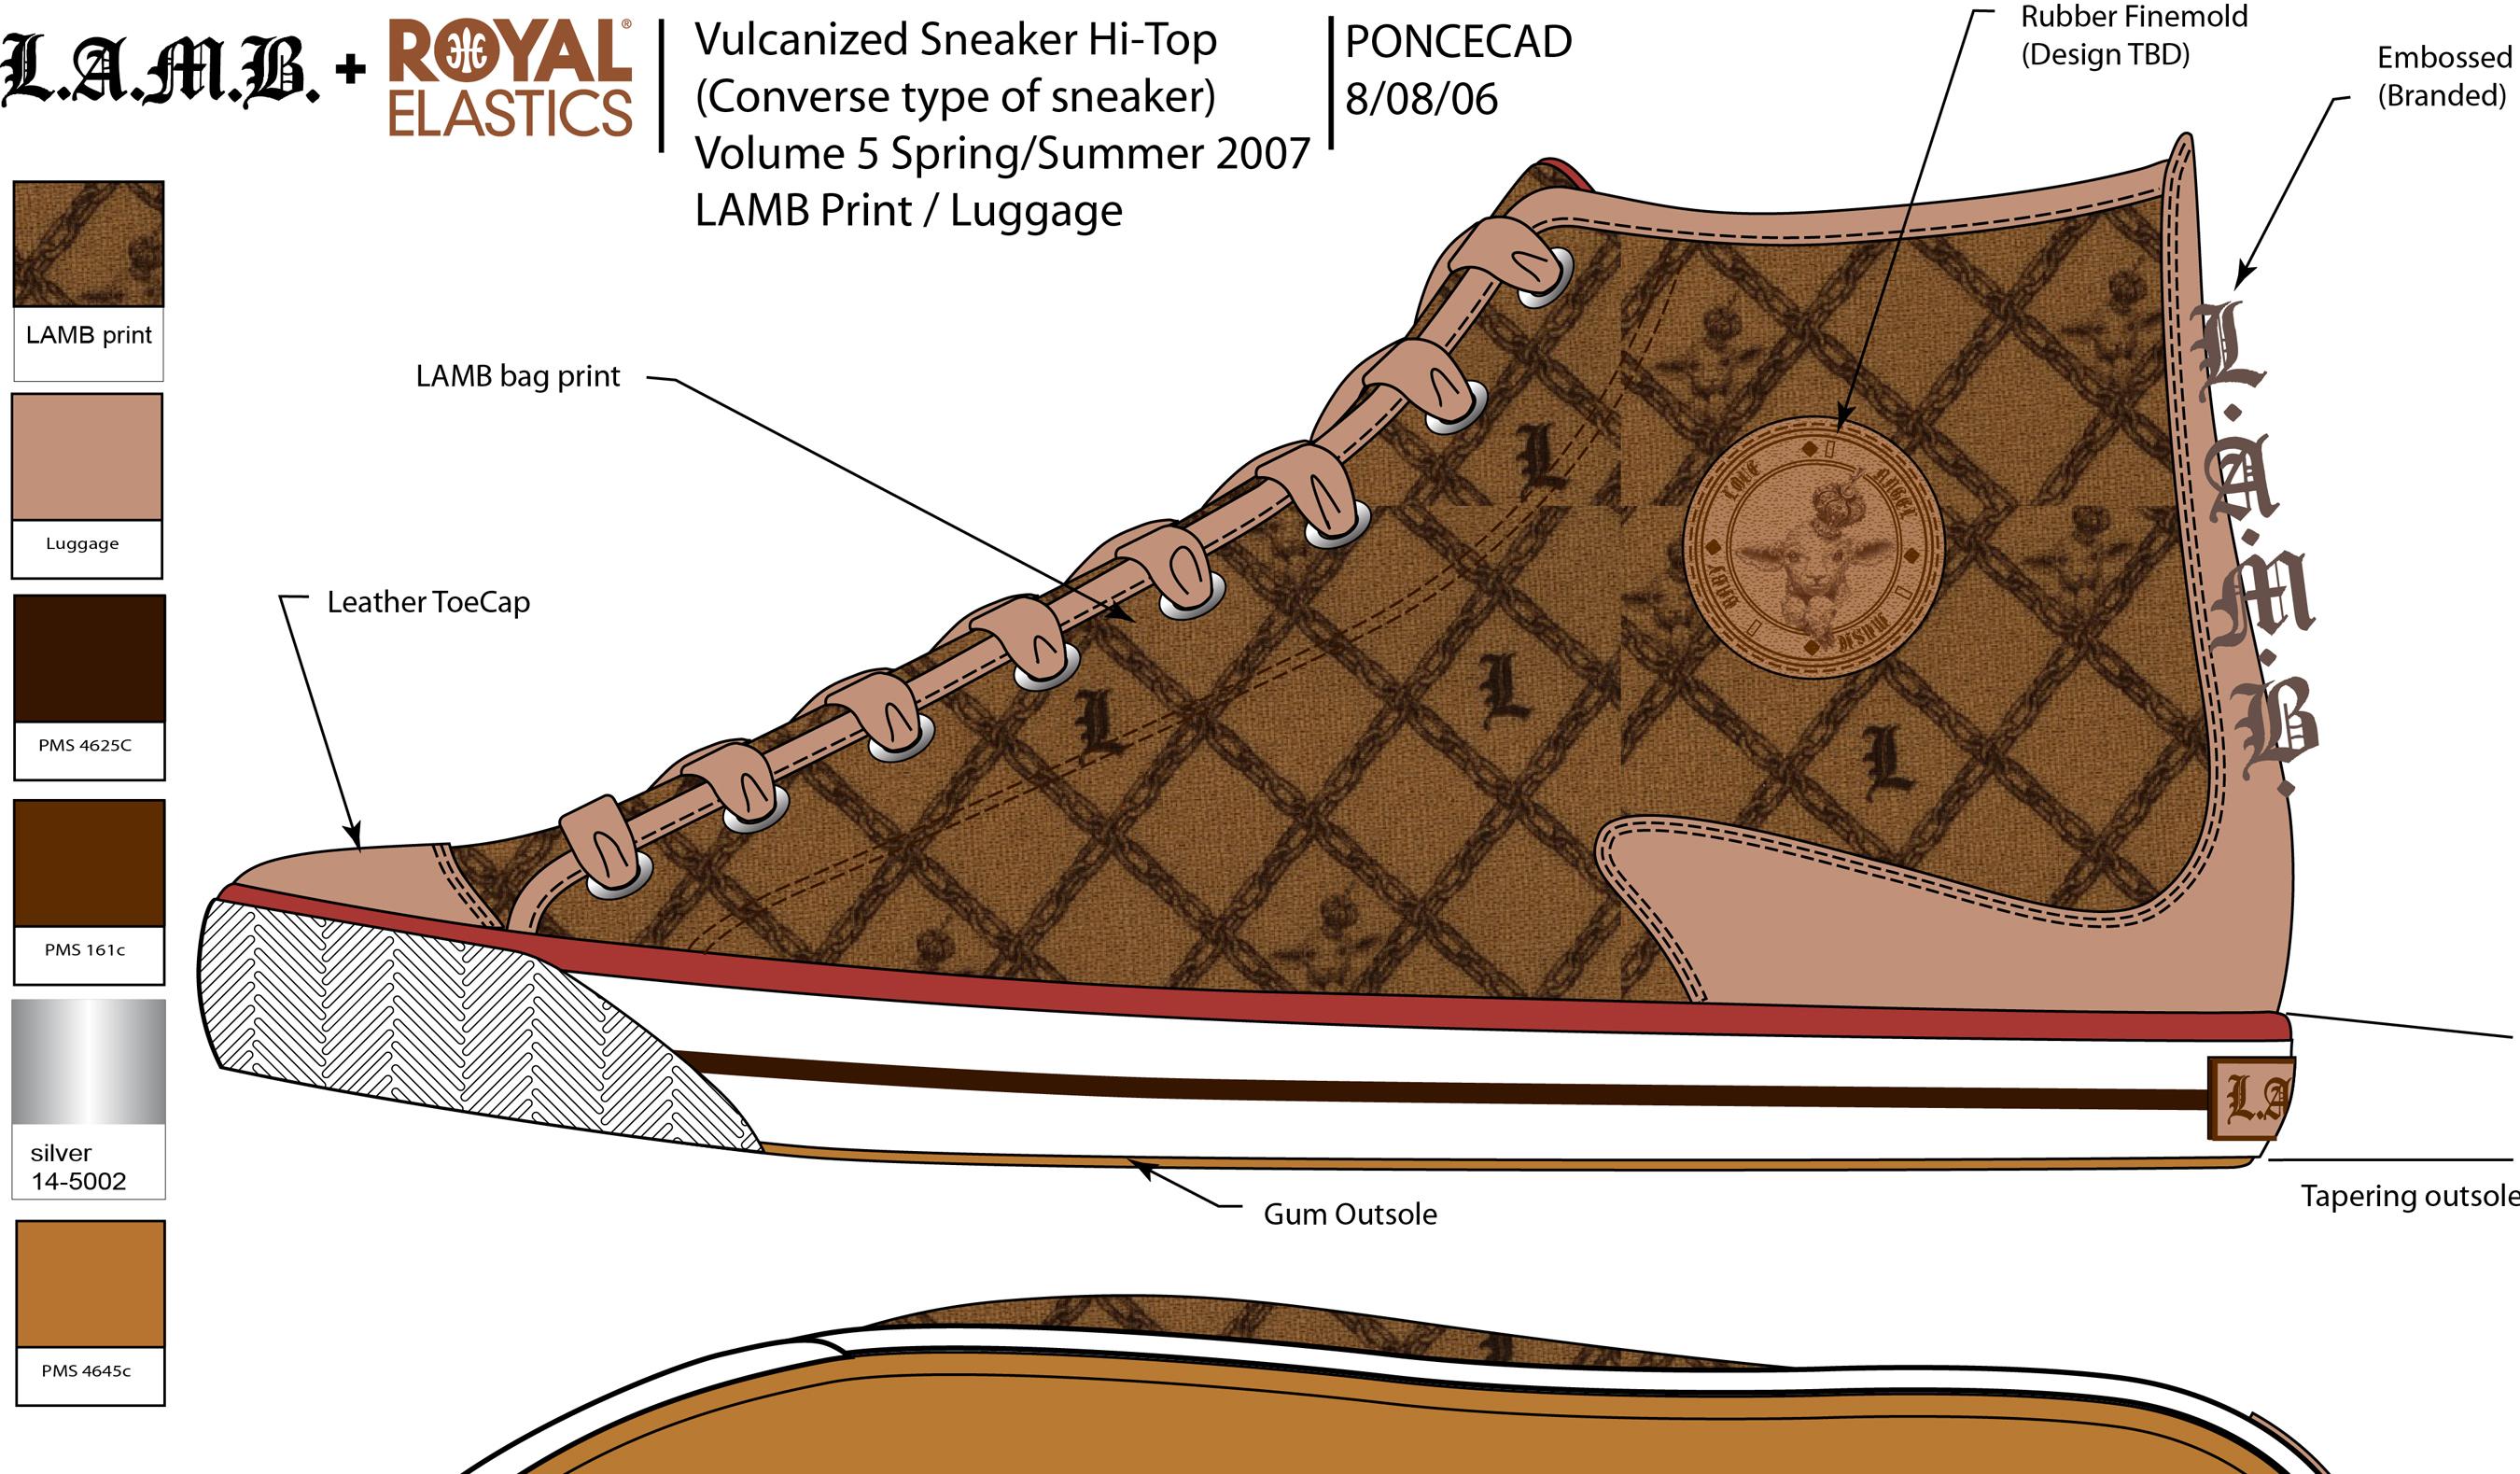 LAMB Vulcanized Sneaker Side Hi Top